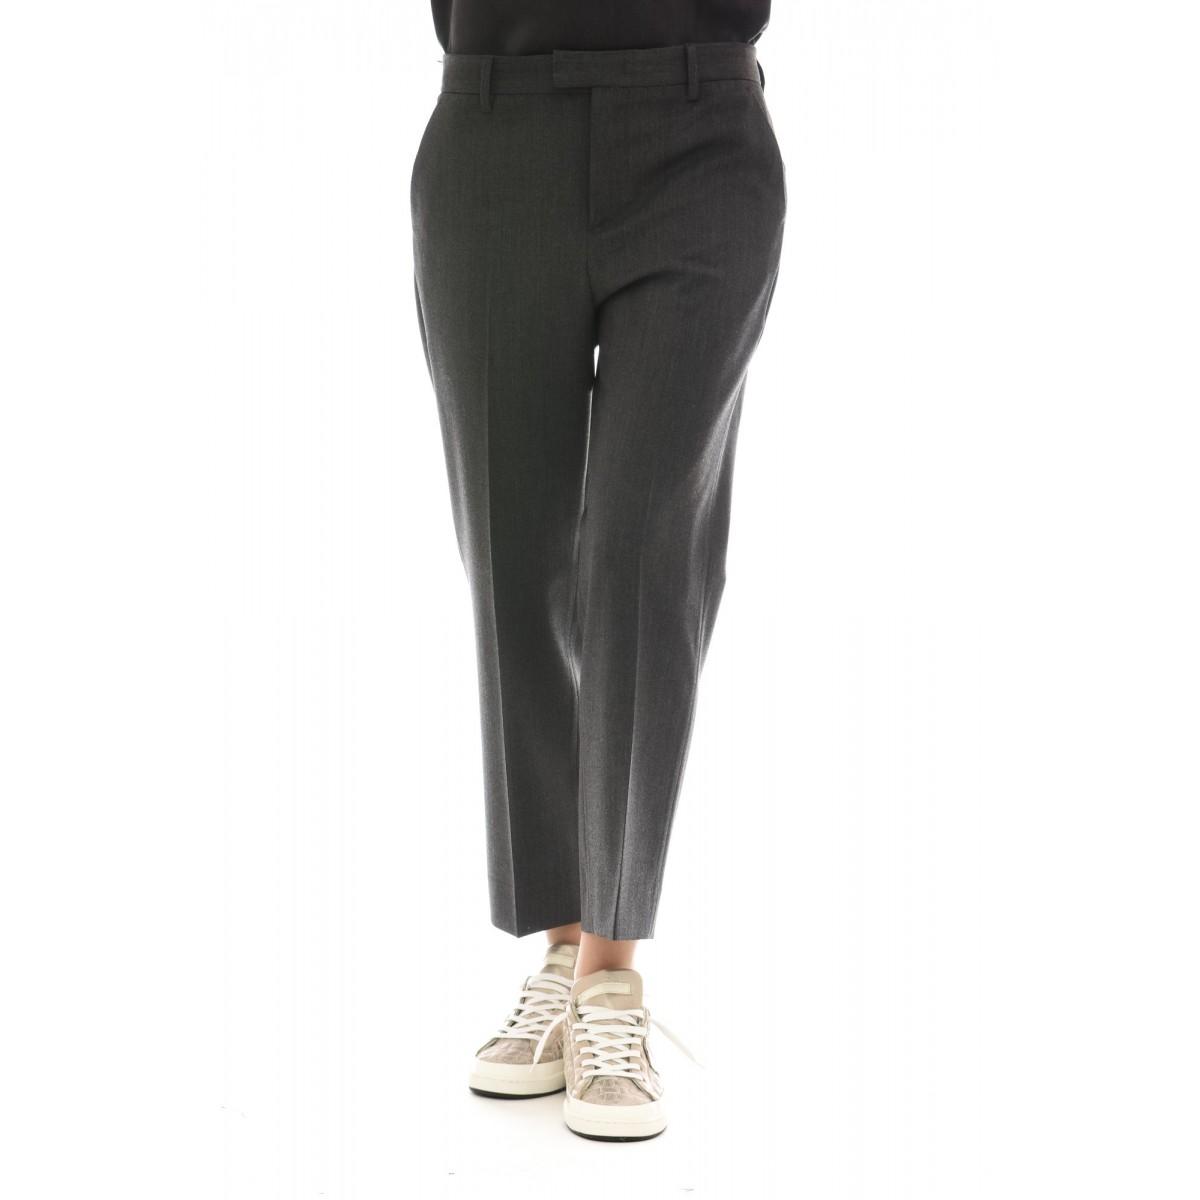 Pantalone donna Pt0w - Cdvsra po36 pantalone largo